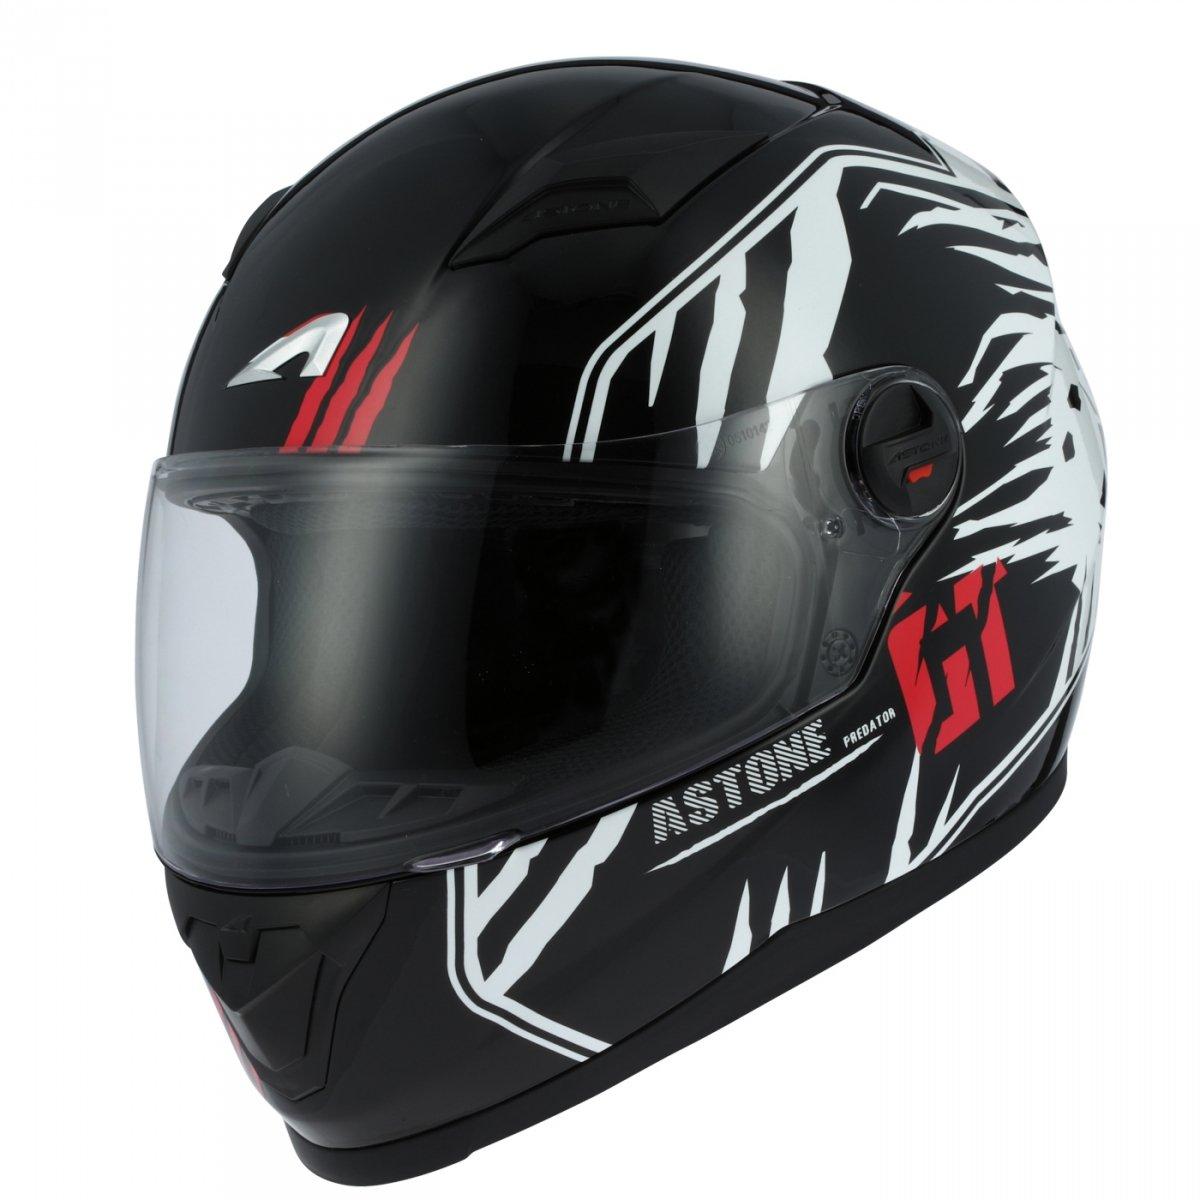 nero//bianco Astone Helmets gt2g-predator-bwxs Casco Moto Integrale GT taglia XS